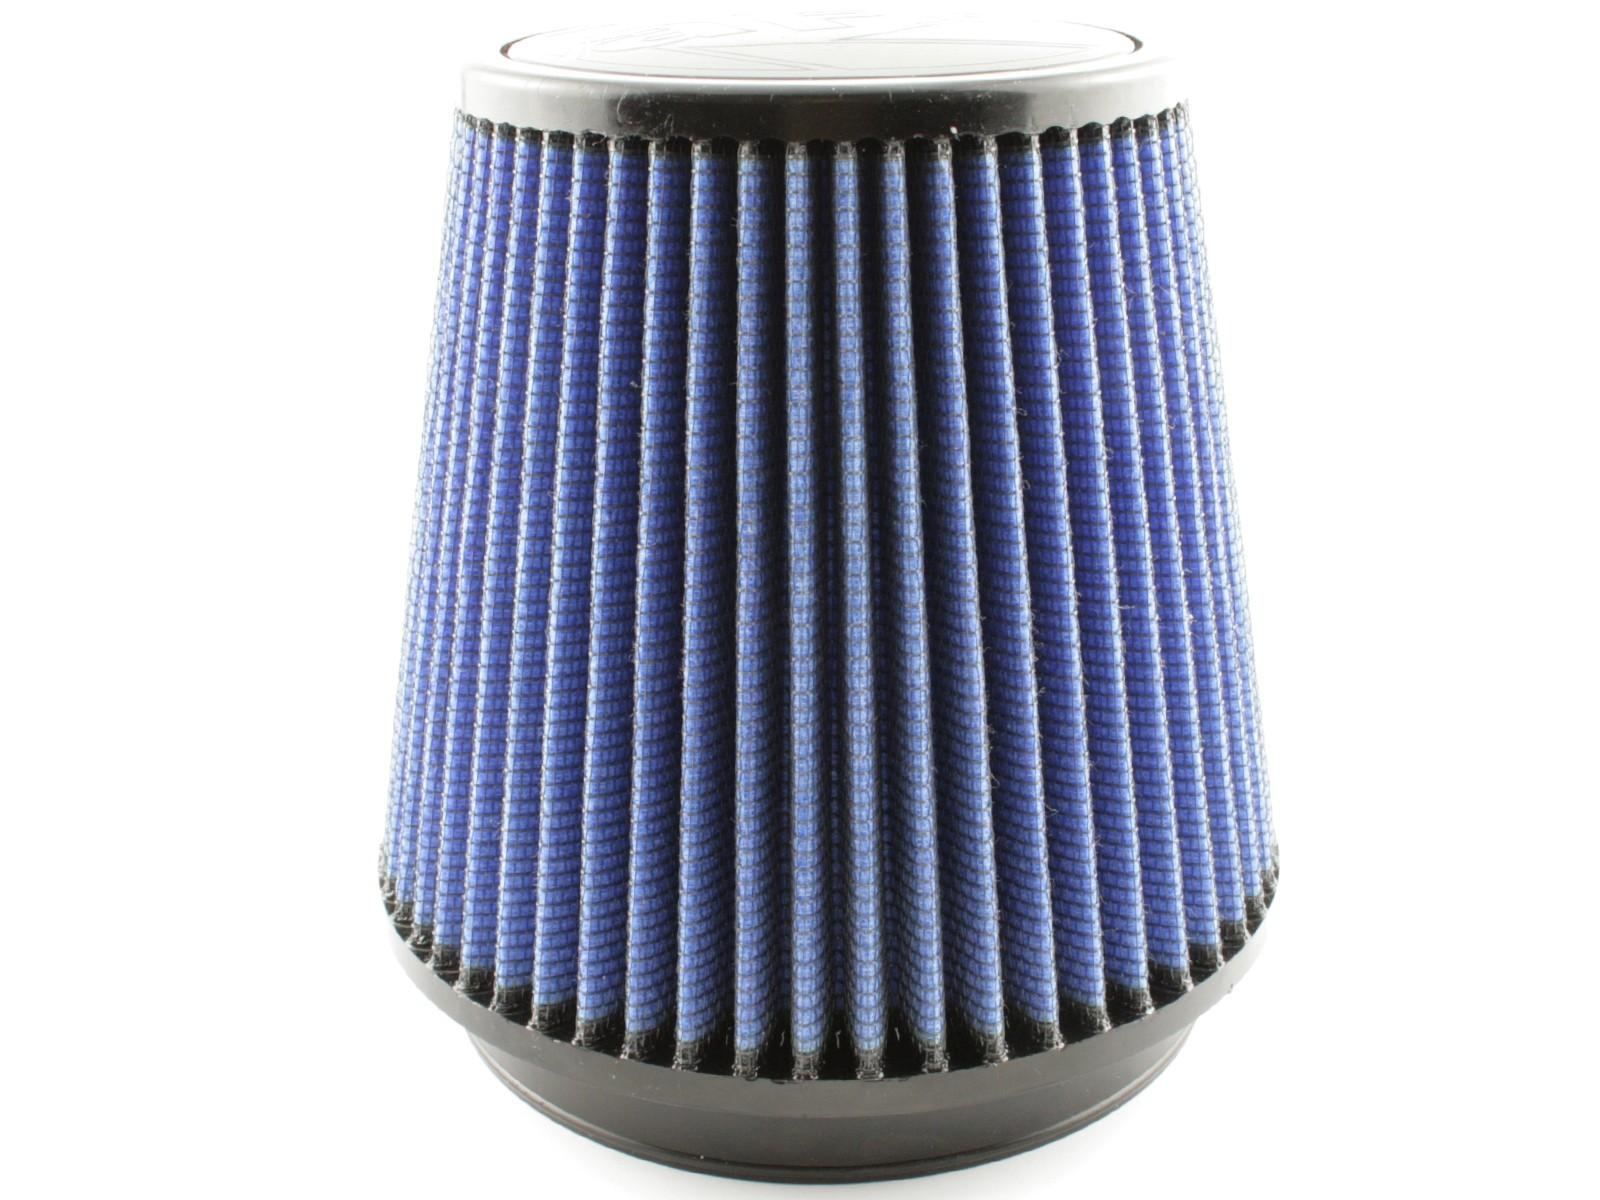 aFe POWER 24-60507 Magnum FLOW Pro 5R Air Filter